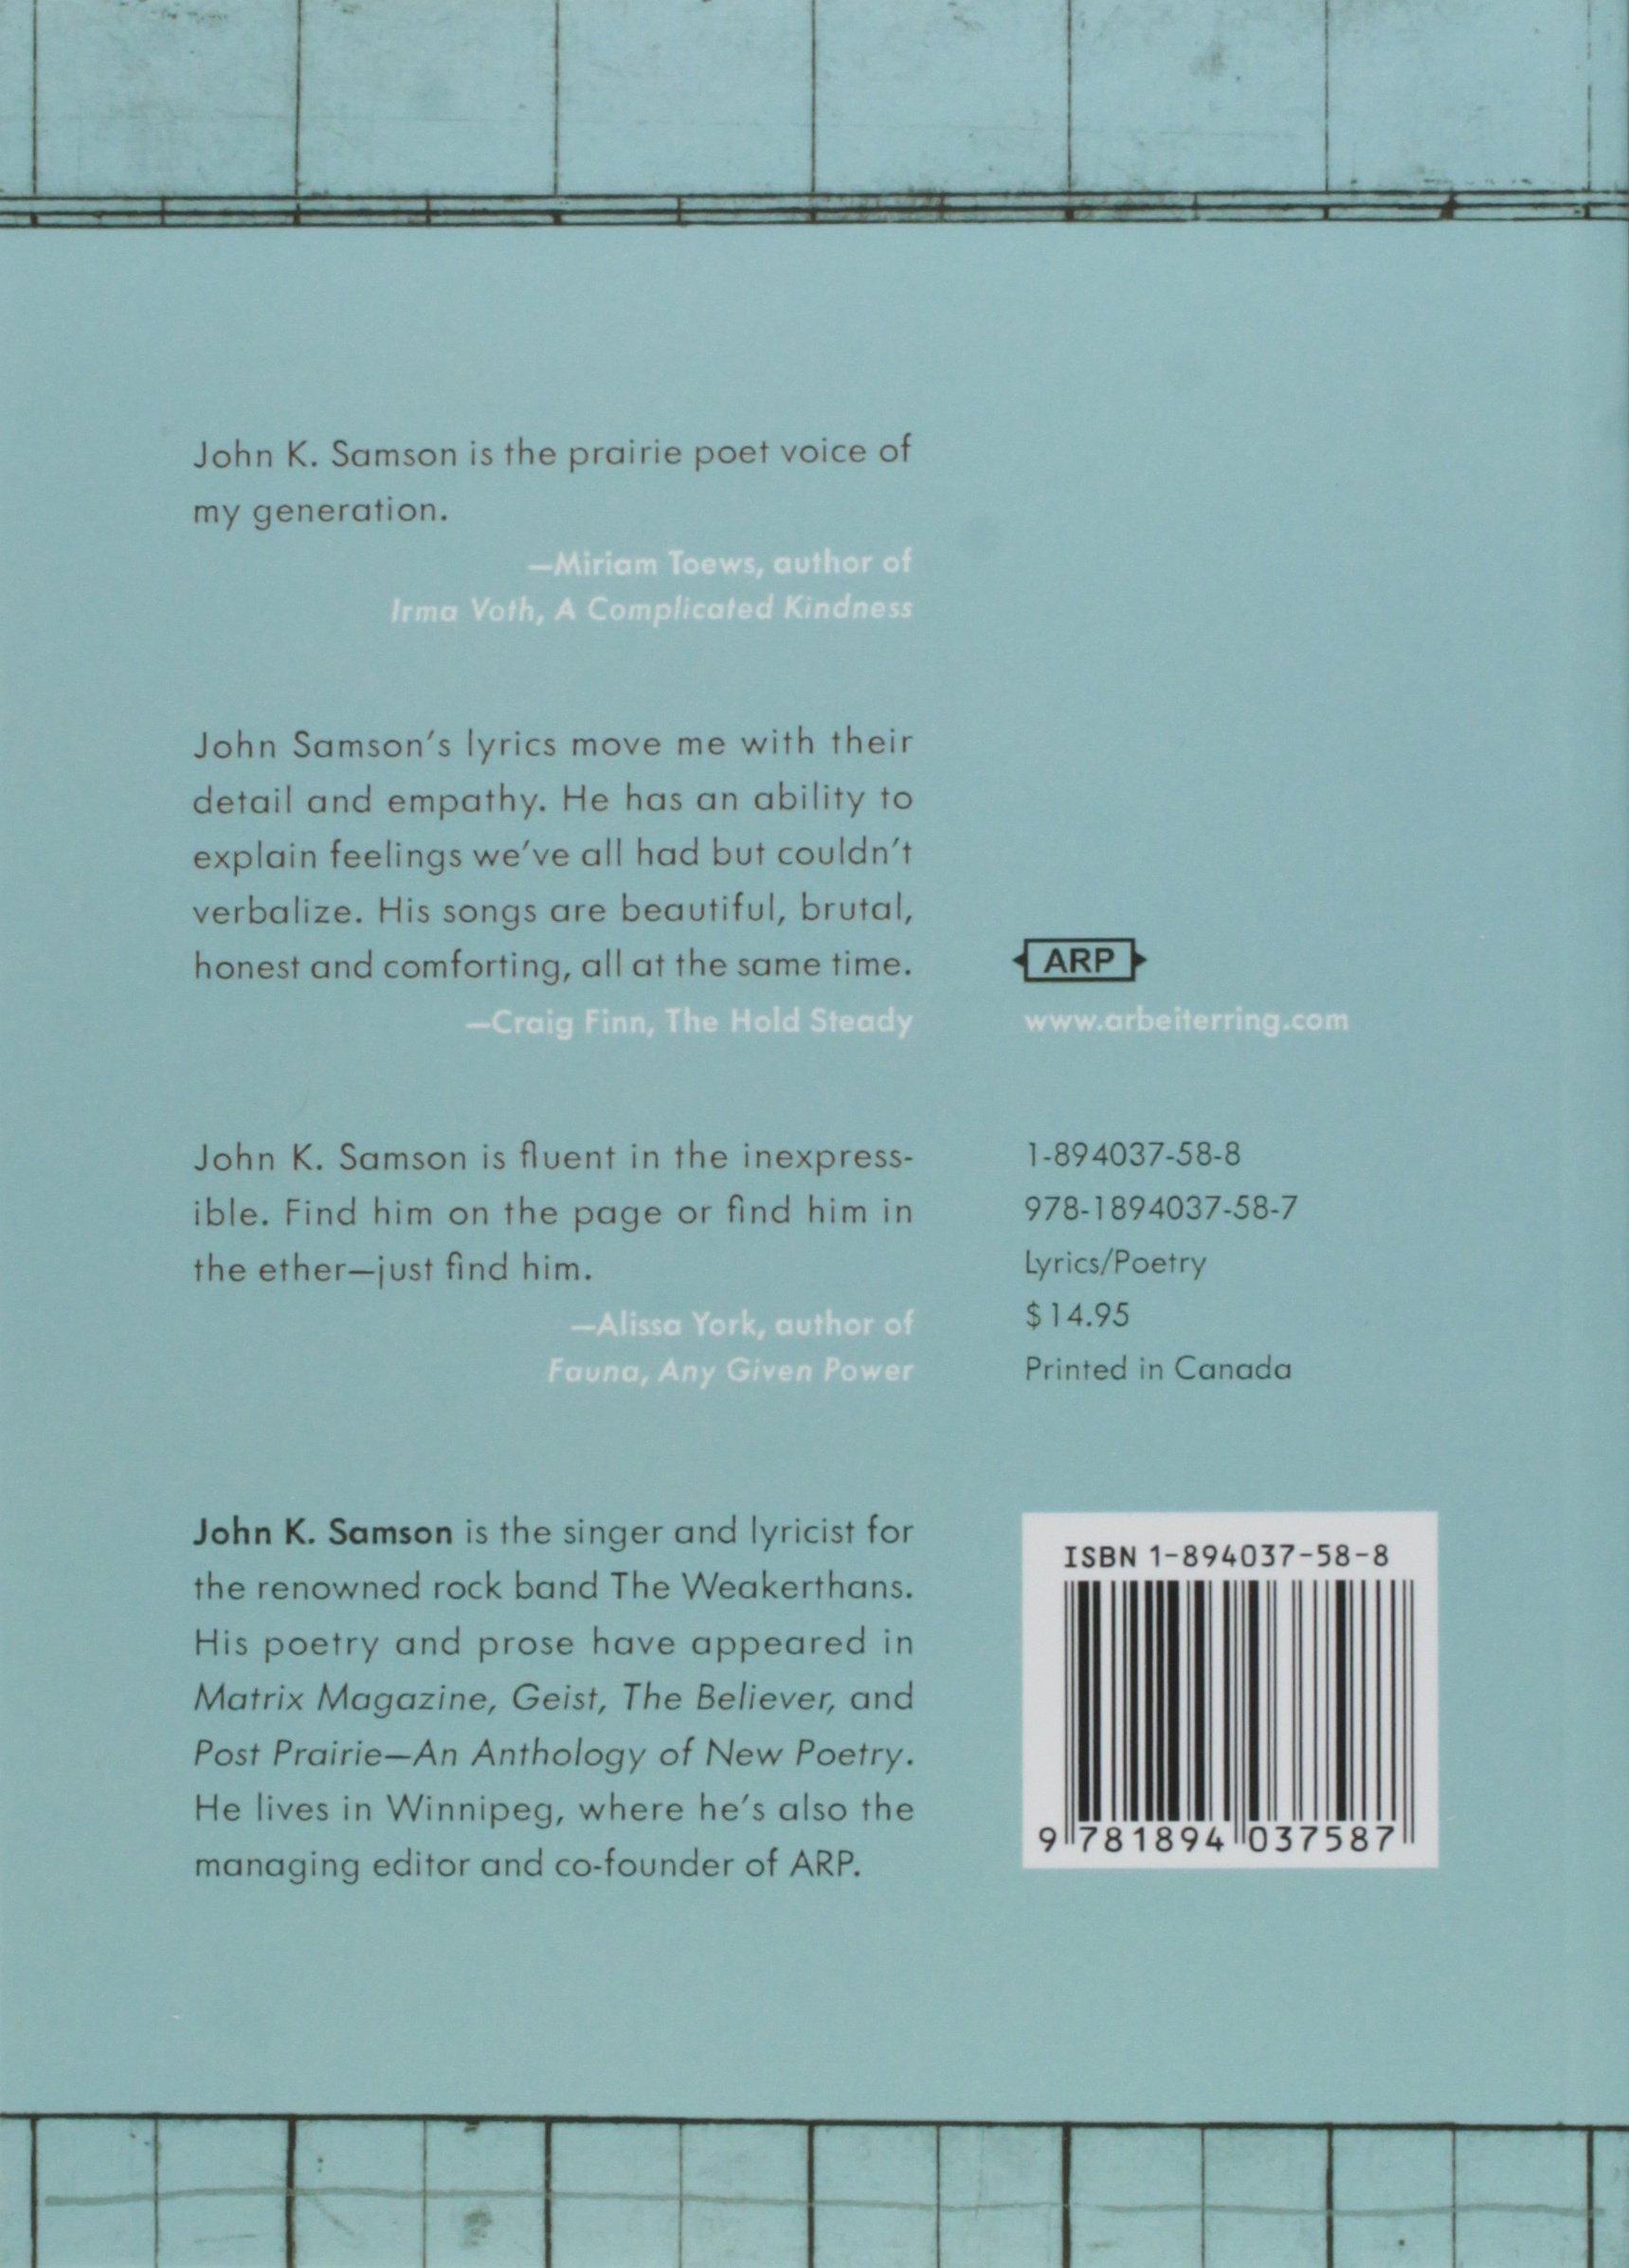 Lyrics and Poems, 1997-2012: John K. Samson: 9781894037587: Amazon ...